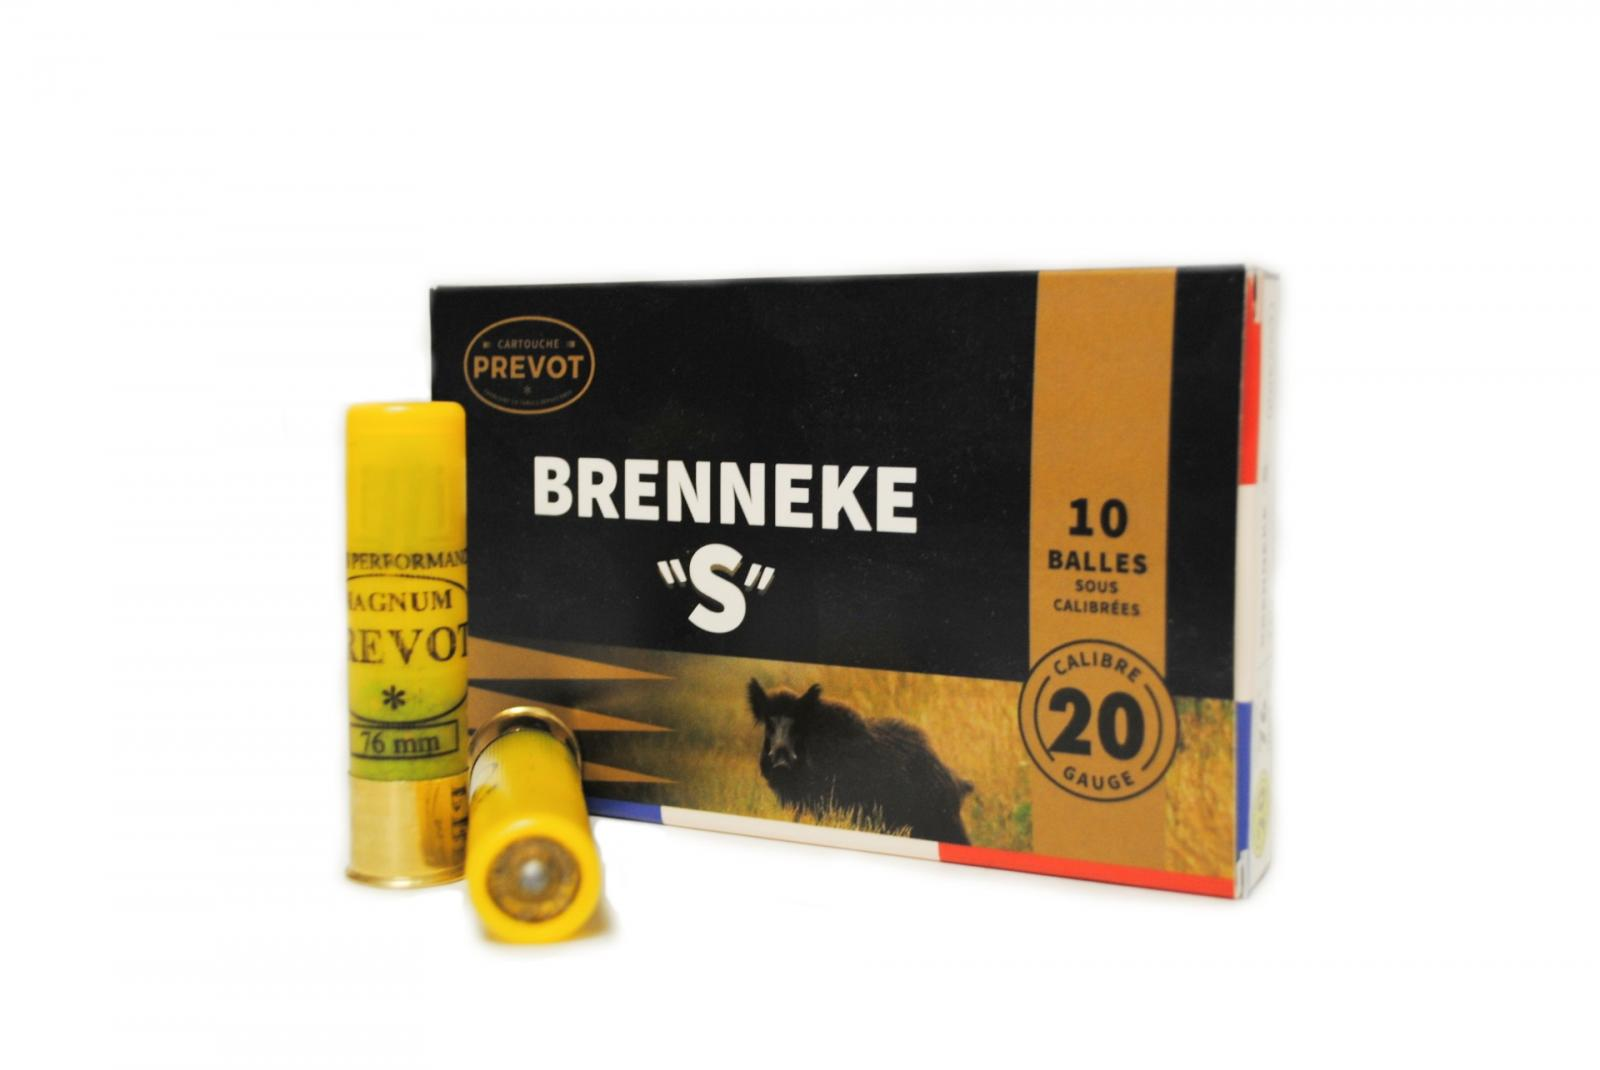 "Boite de 10 balles BRENNEKE ""S"" calibre 20 BR3S"